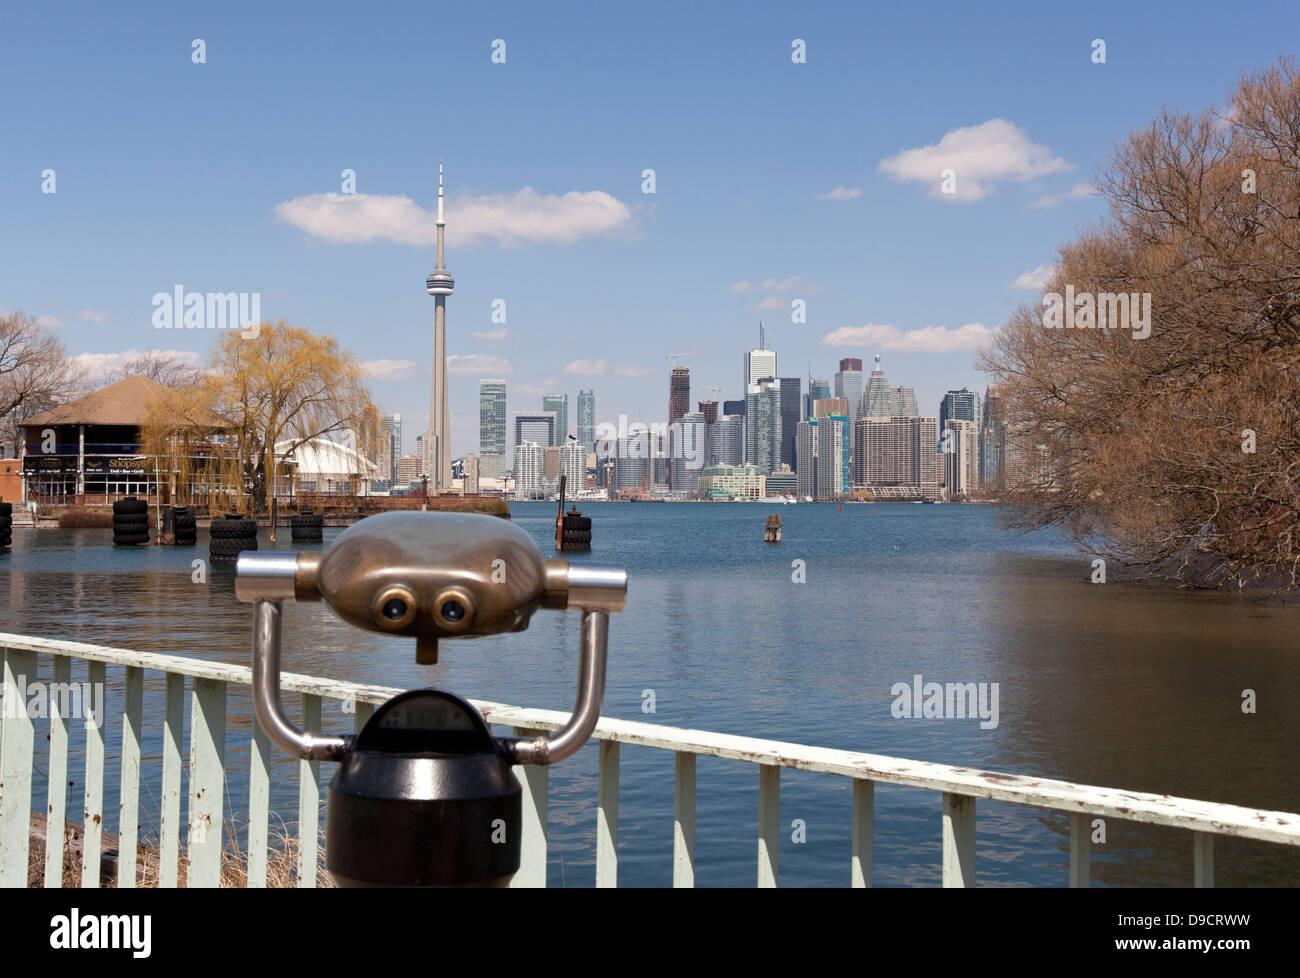 toronto city skyline and telescope viewer - Stock Image